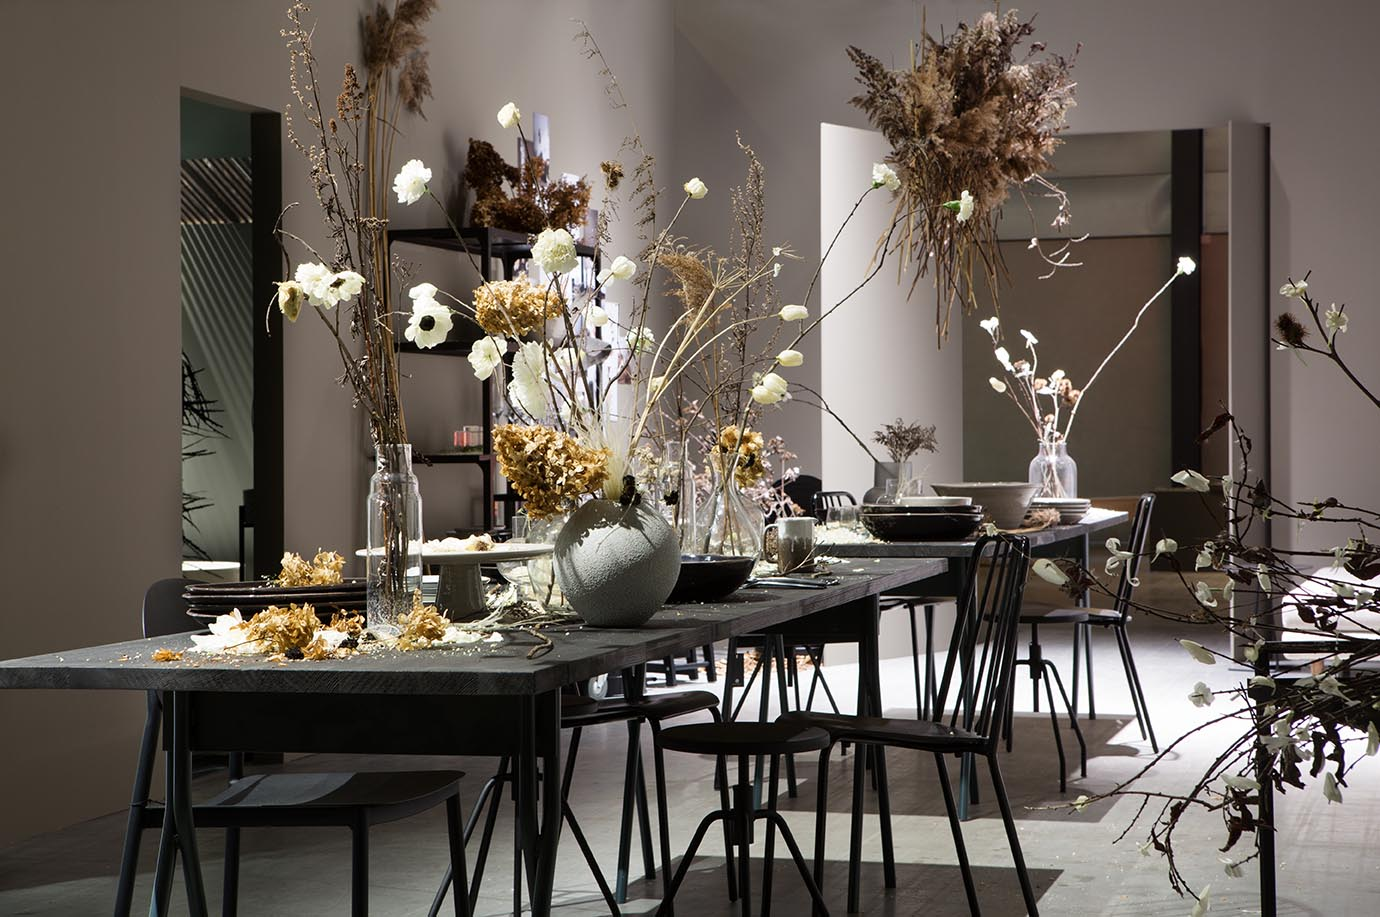 oslo-design-fair-mina-milanda-blomster-floralsk